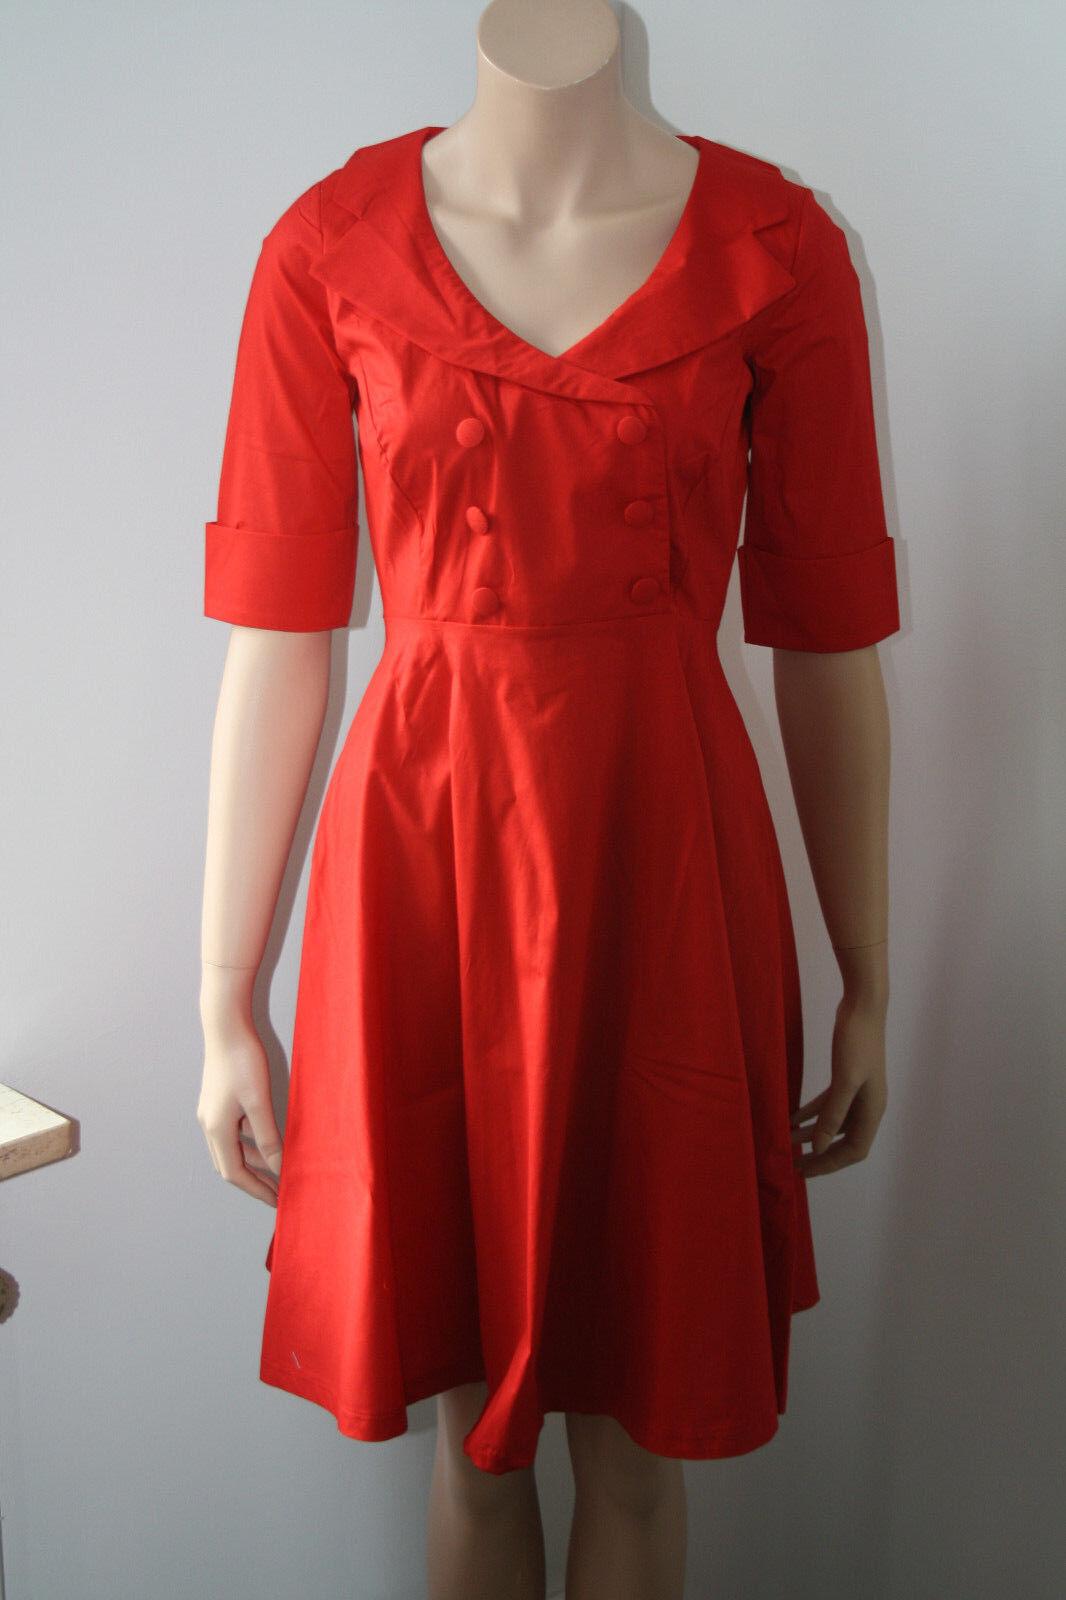 Lien & Giel, Sommerkleid, rot, 60er Jahre Stil, Kurzarm SALE %%